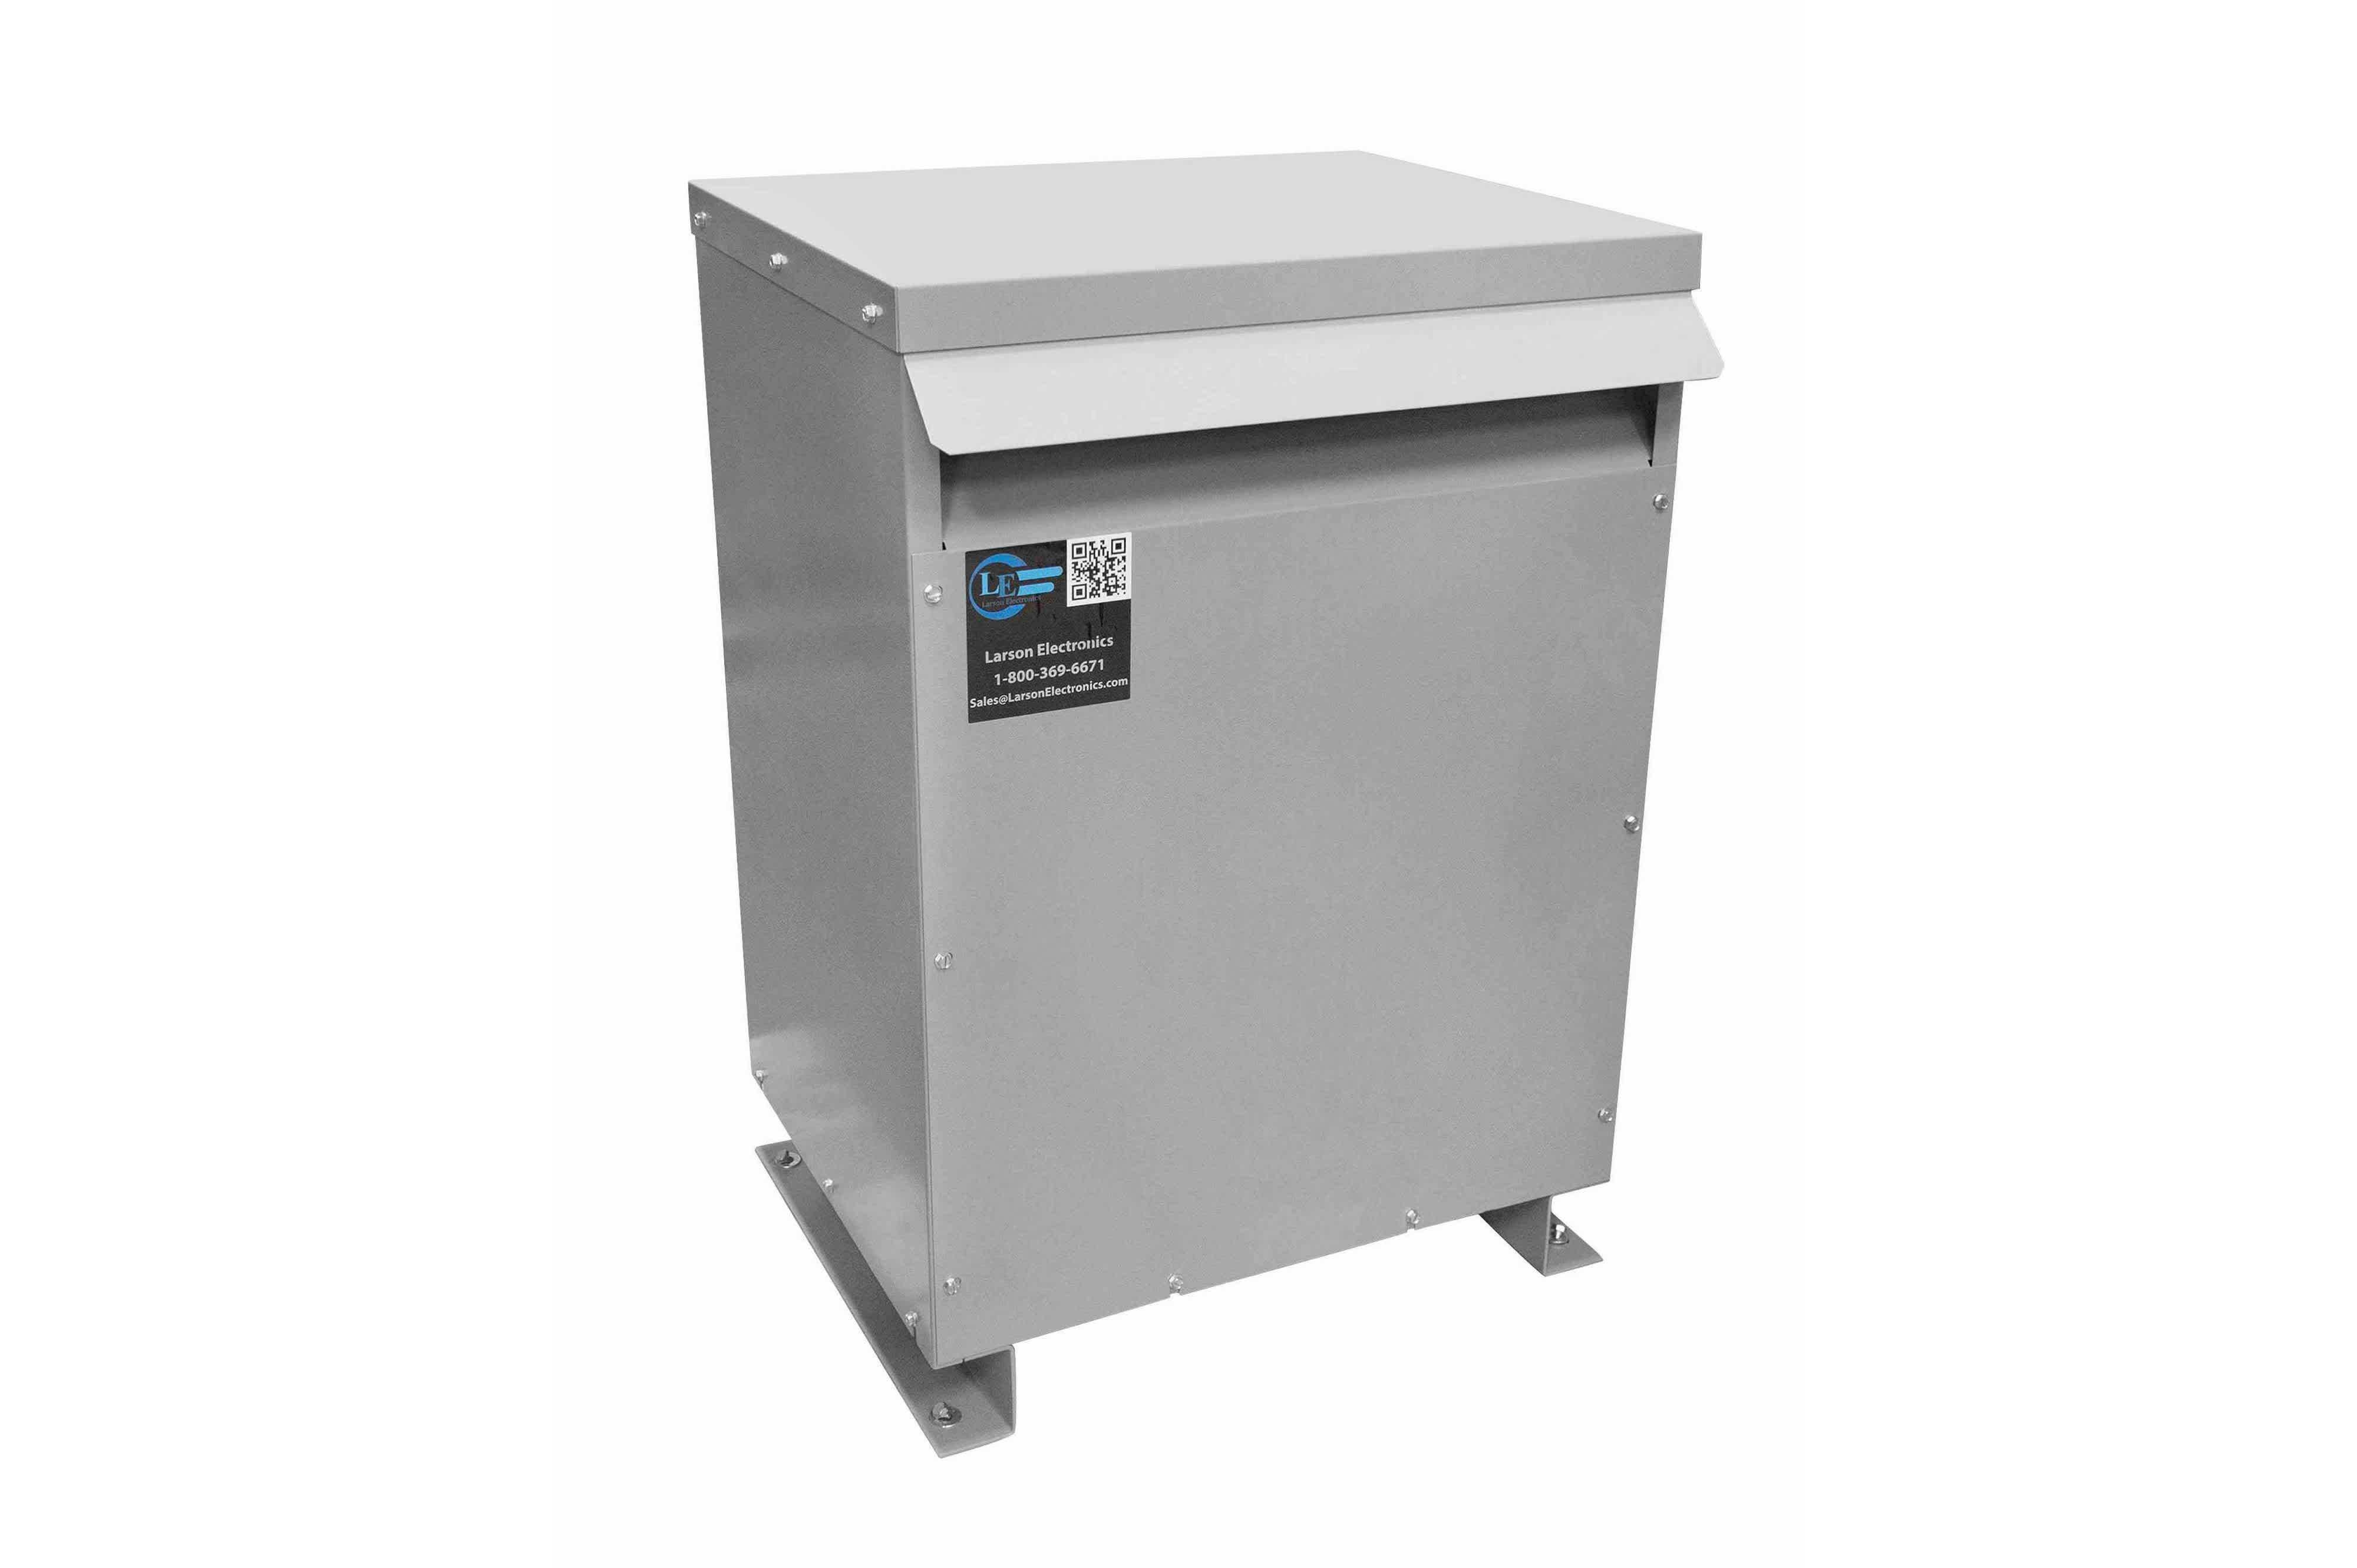 225 kVA 3PH Isolation Transformer, 230V Wye Primary, 208Y/120 Wye-N Secondary, N3R, Ventilated, 60 Hz